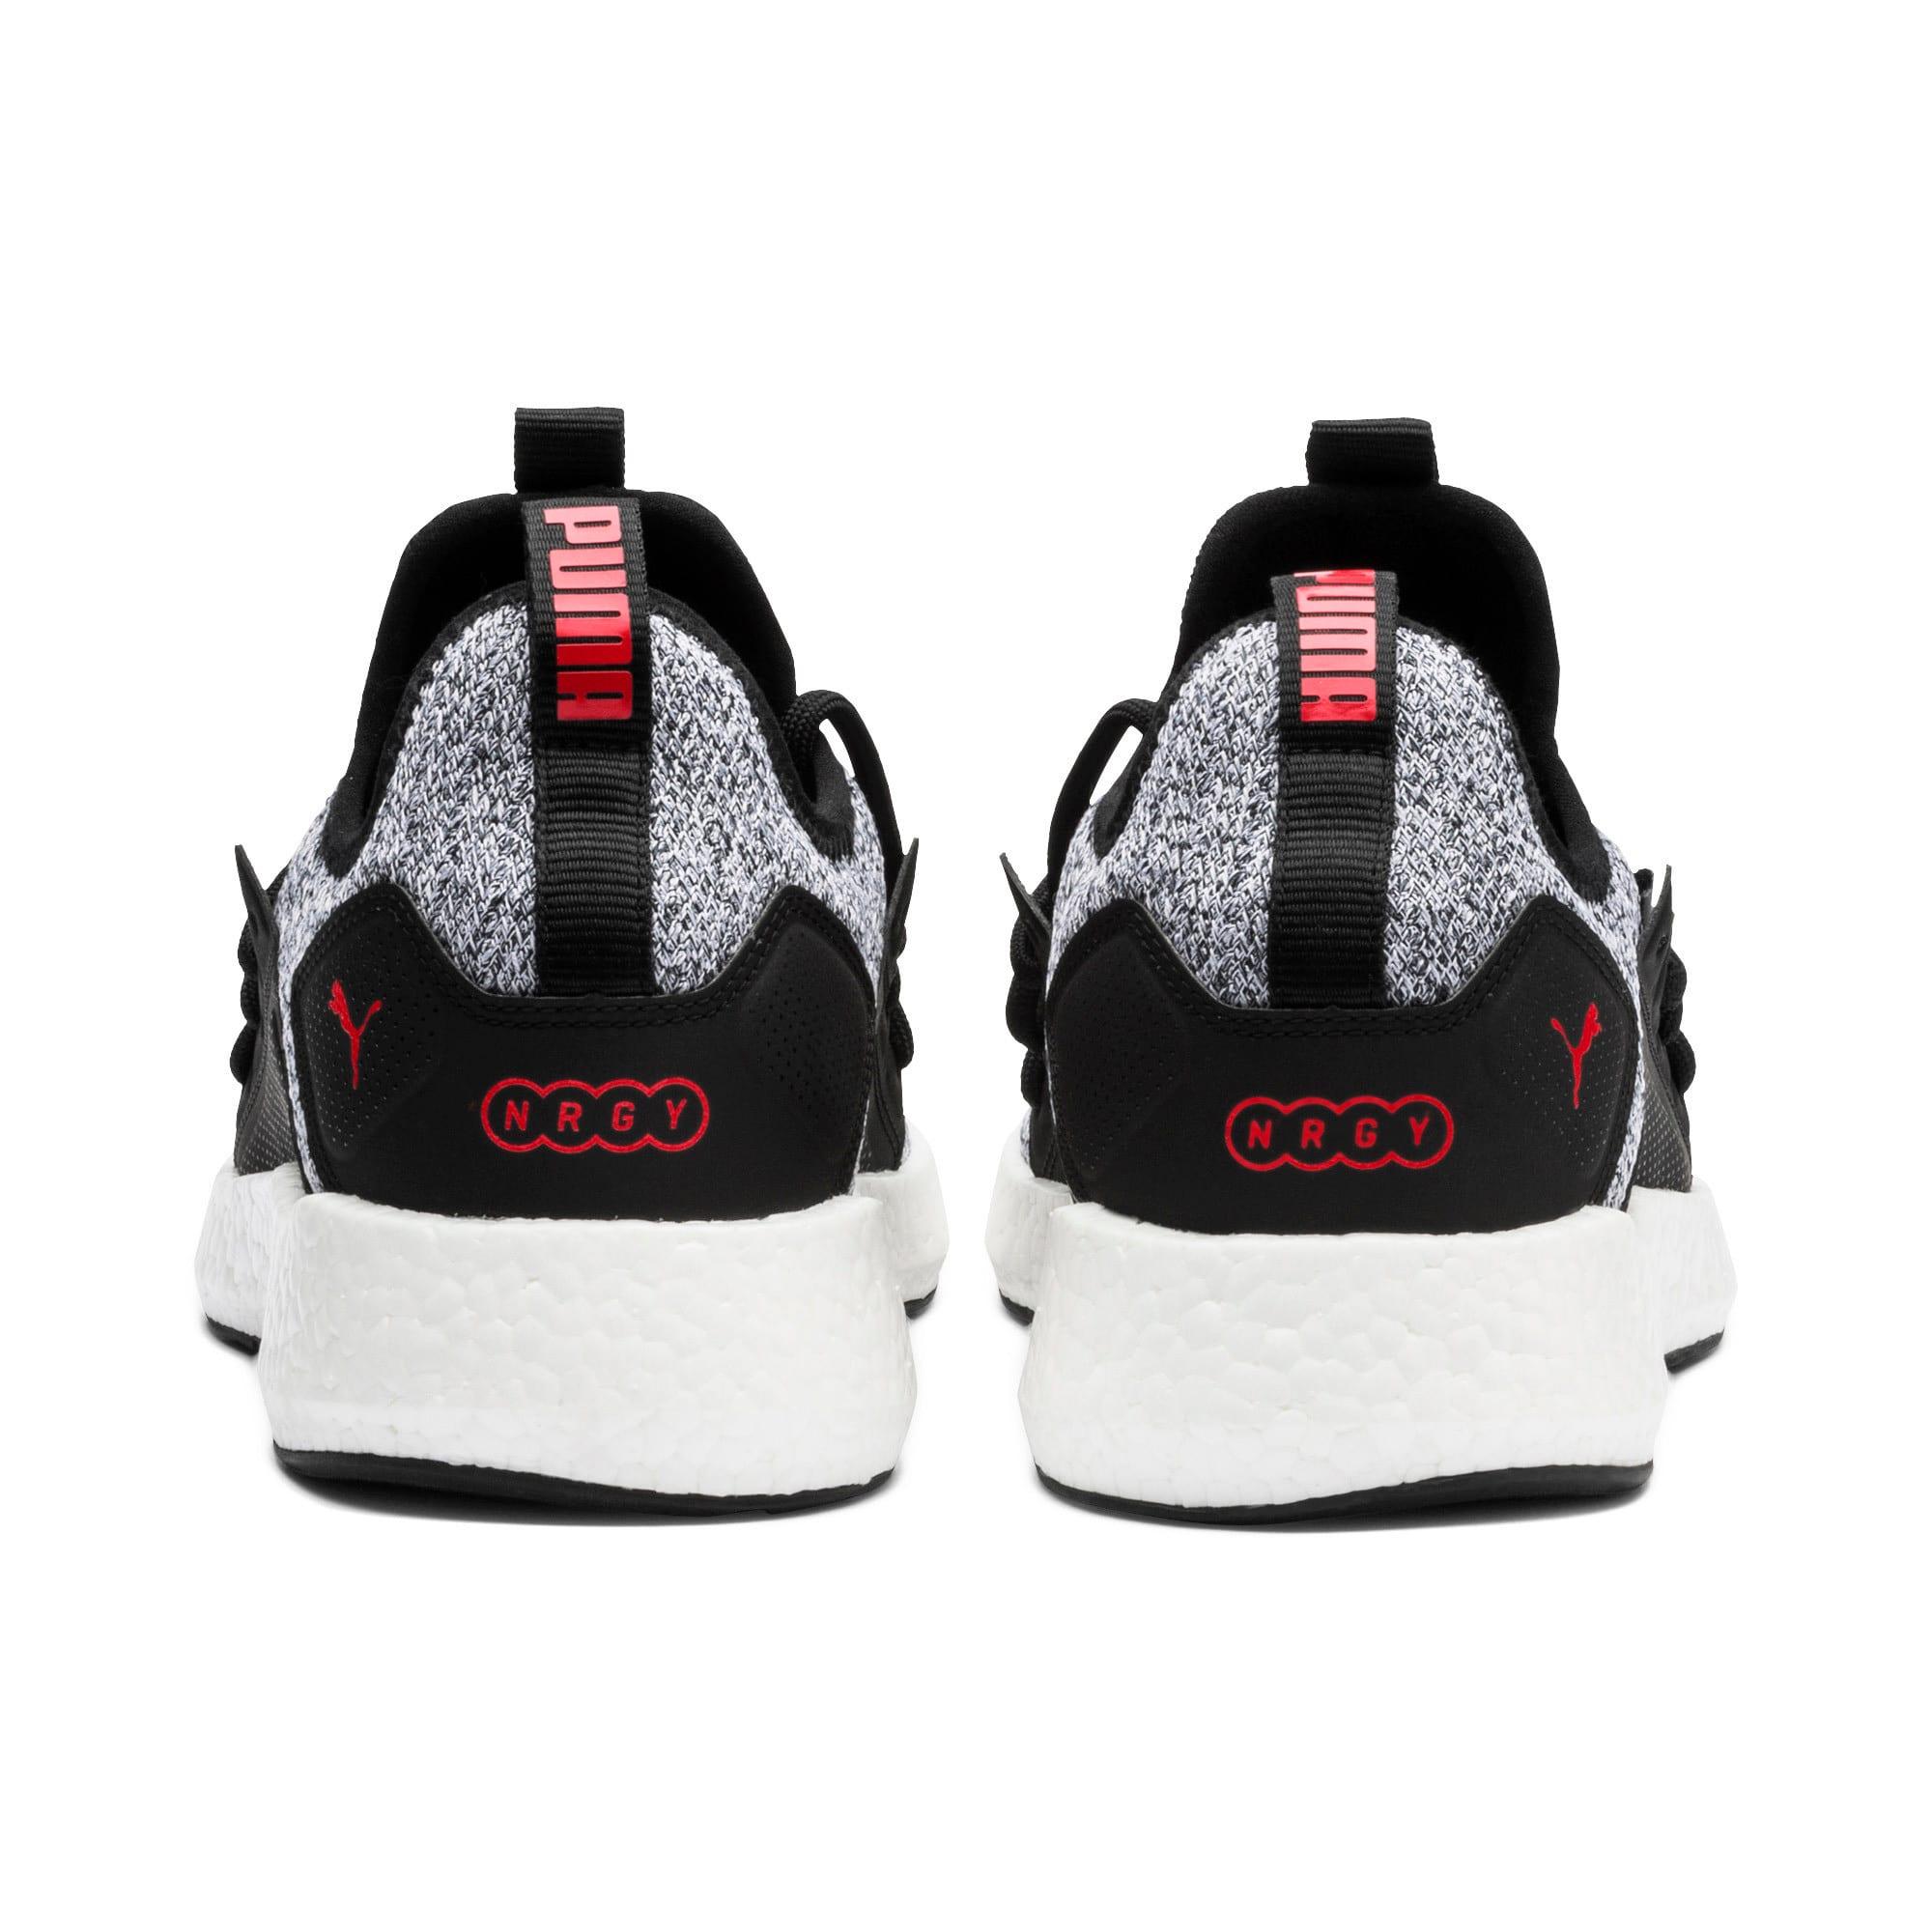 Thumbnail 4 of NRGY Neko Knit Men's Running Shoes, Puma Black-High Risk Red, medium